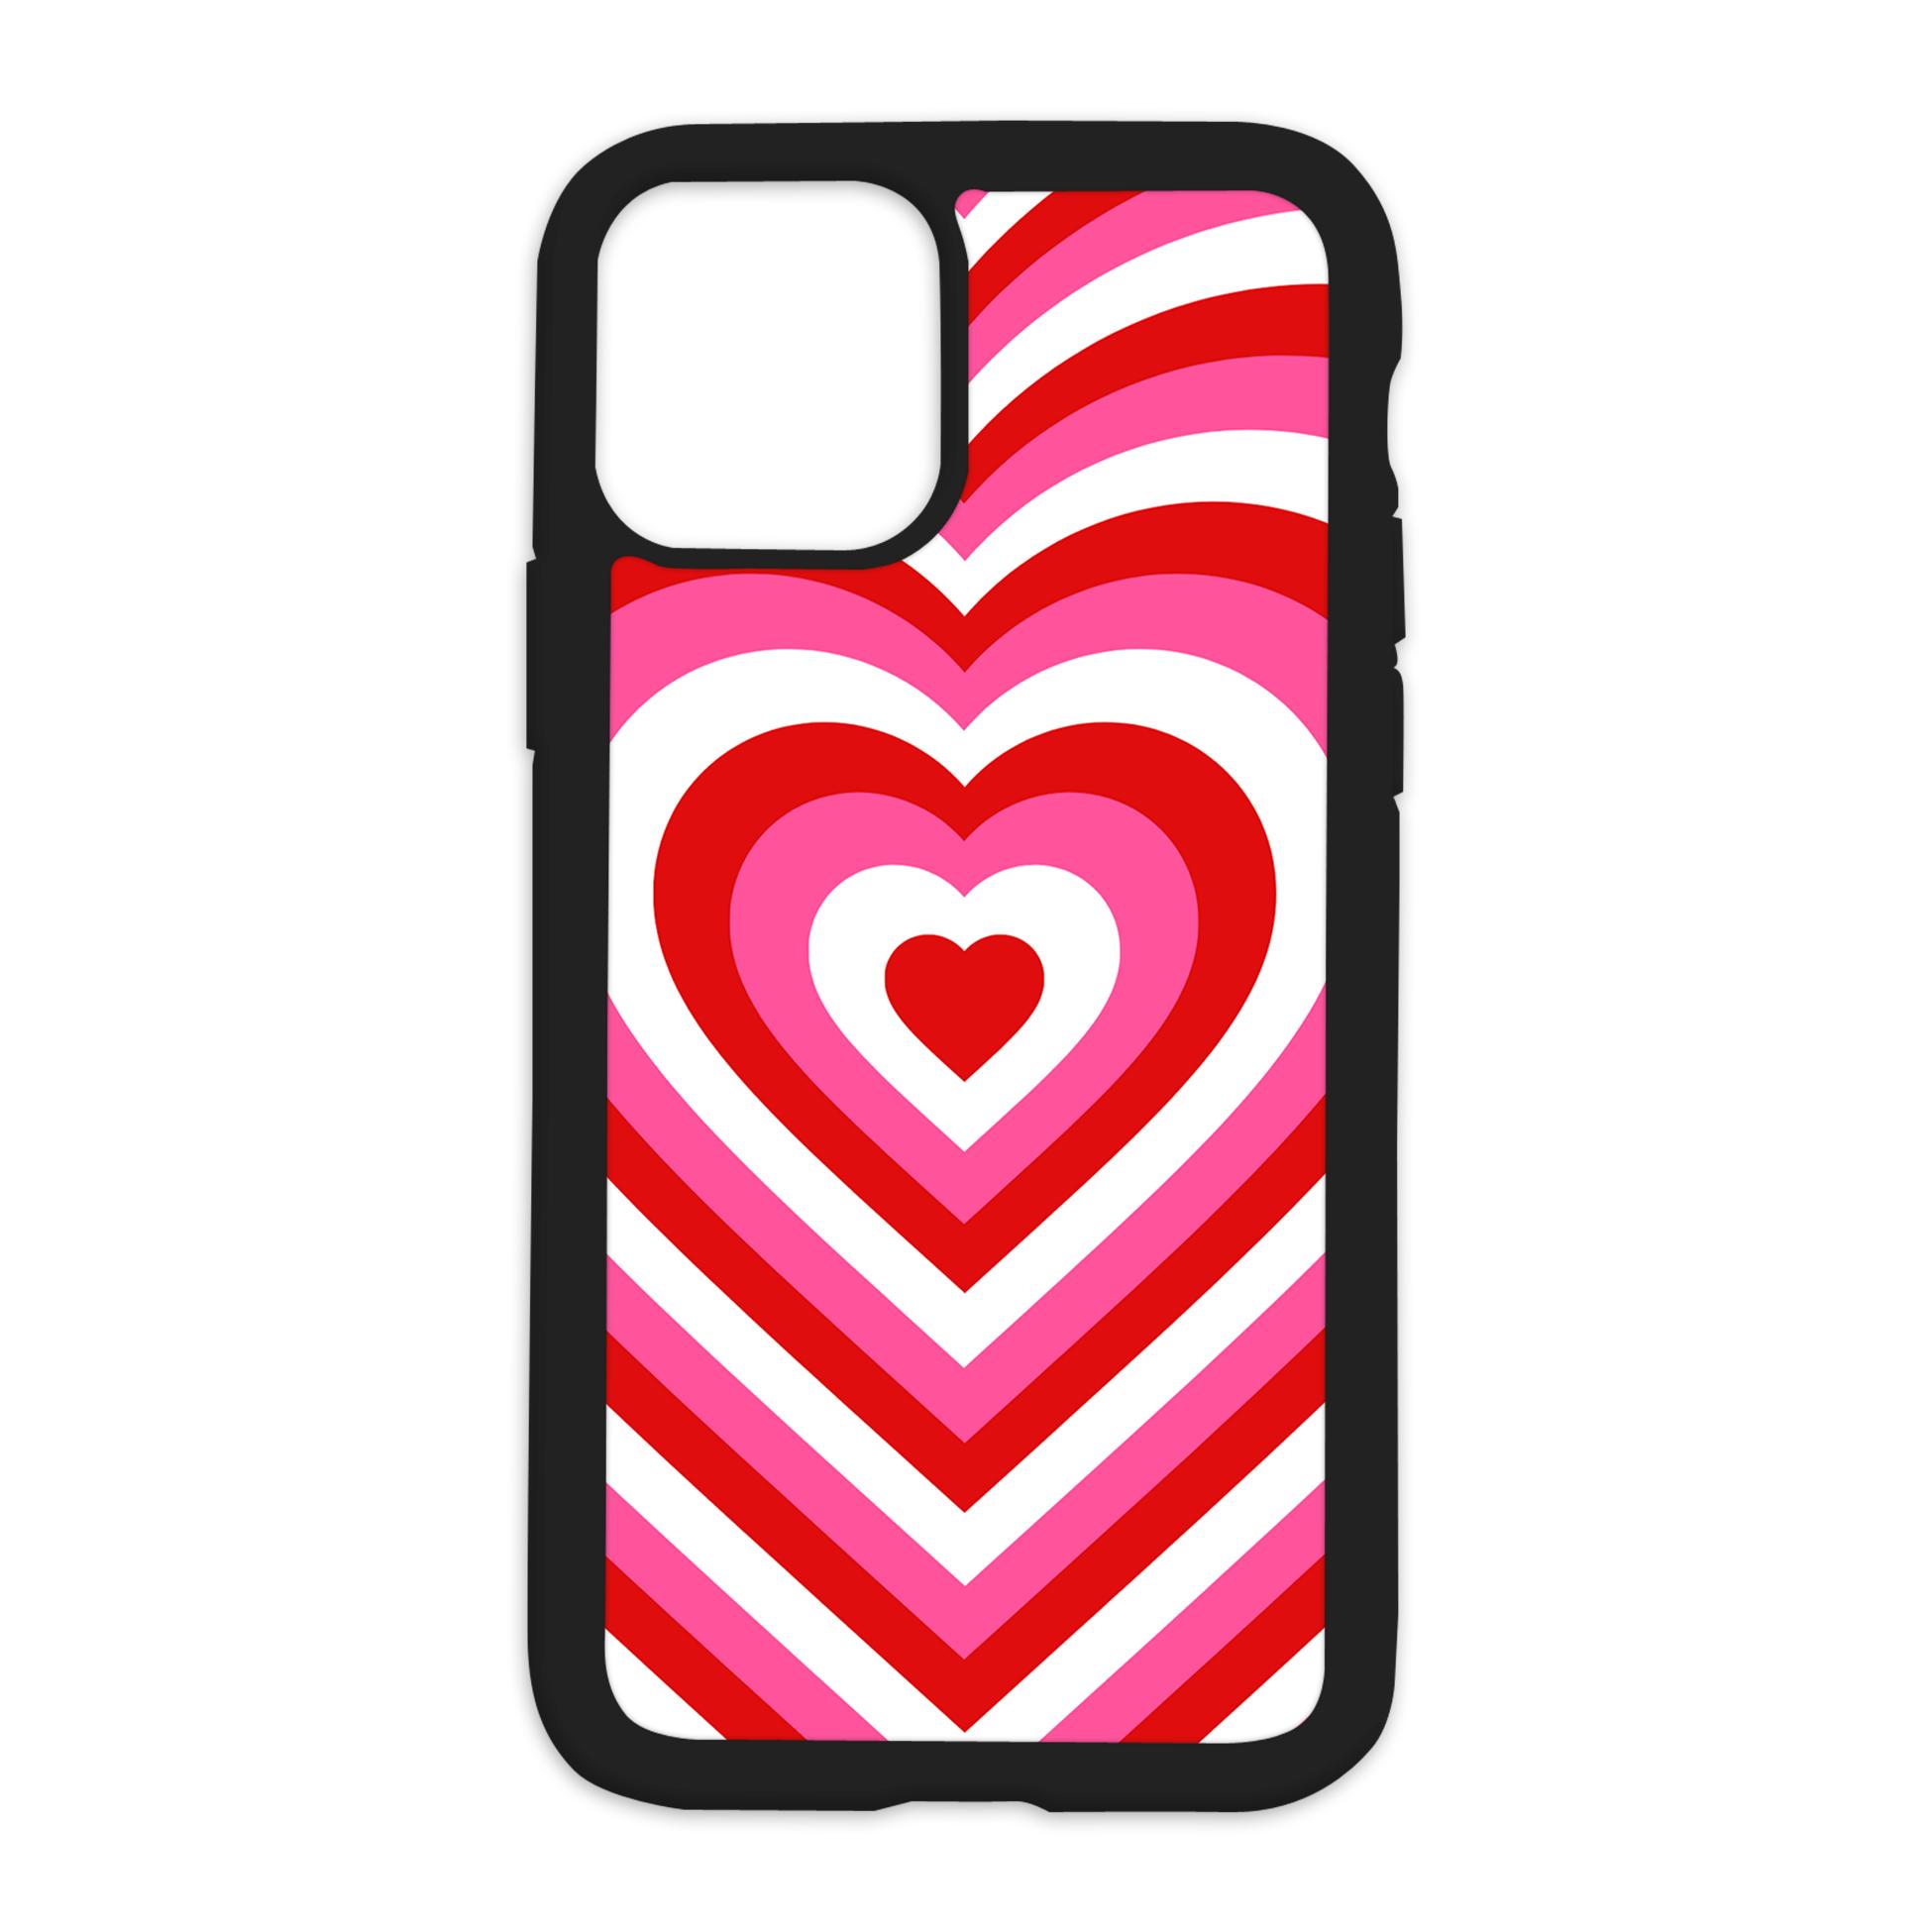 Heart Effect Design On Black Phone Case - XS Max